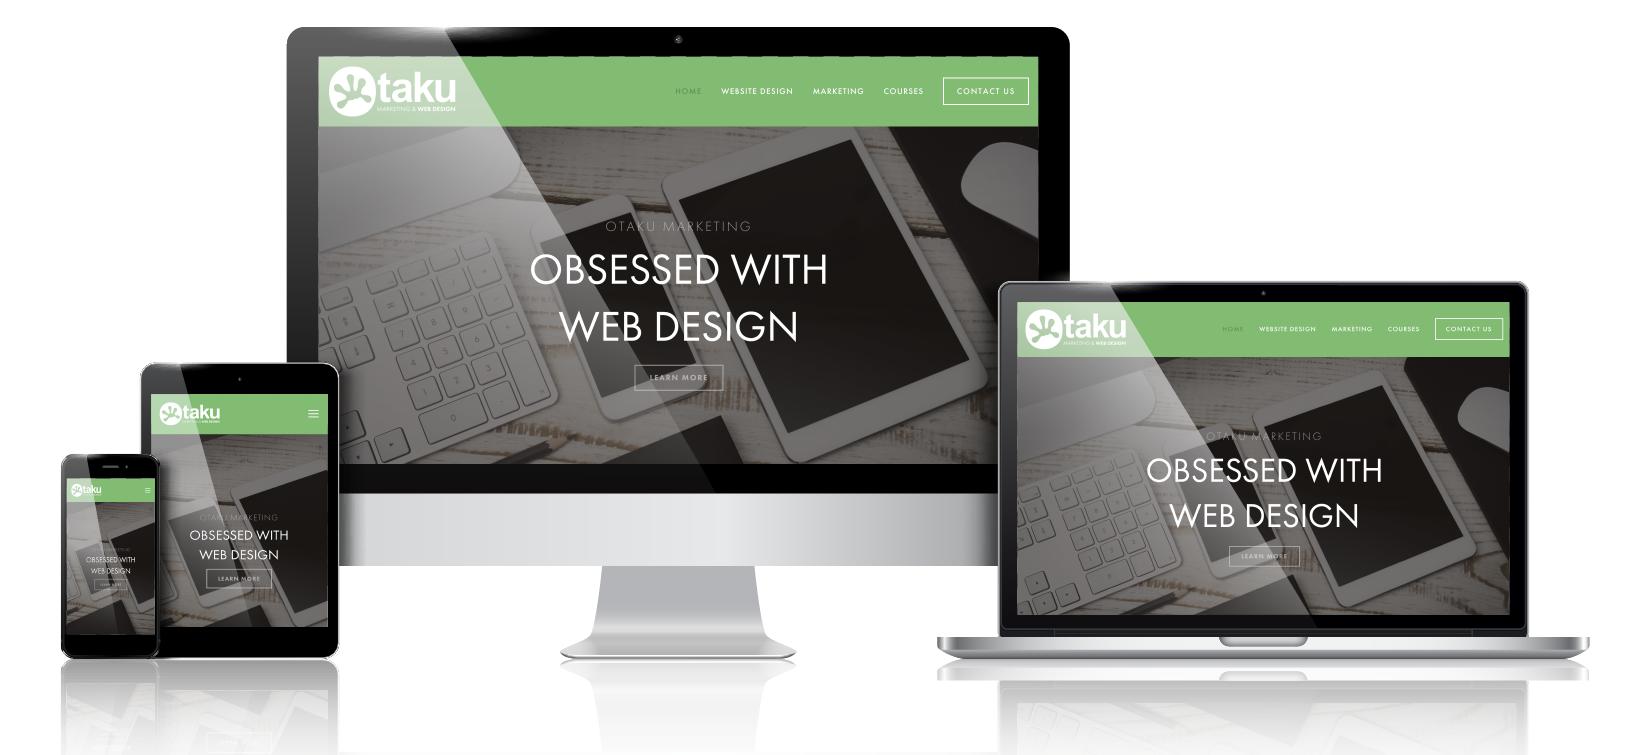 OTAKU MARKETING & WEB DESIGN St. Petersburg, FL - RESPONSIVE WEB DESIGN.png